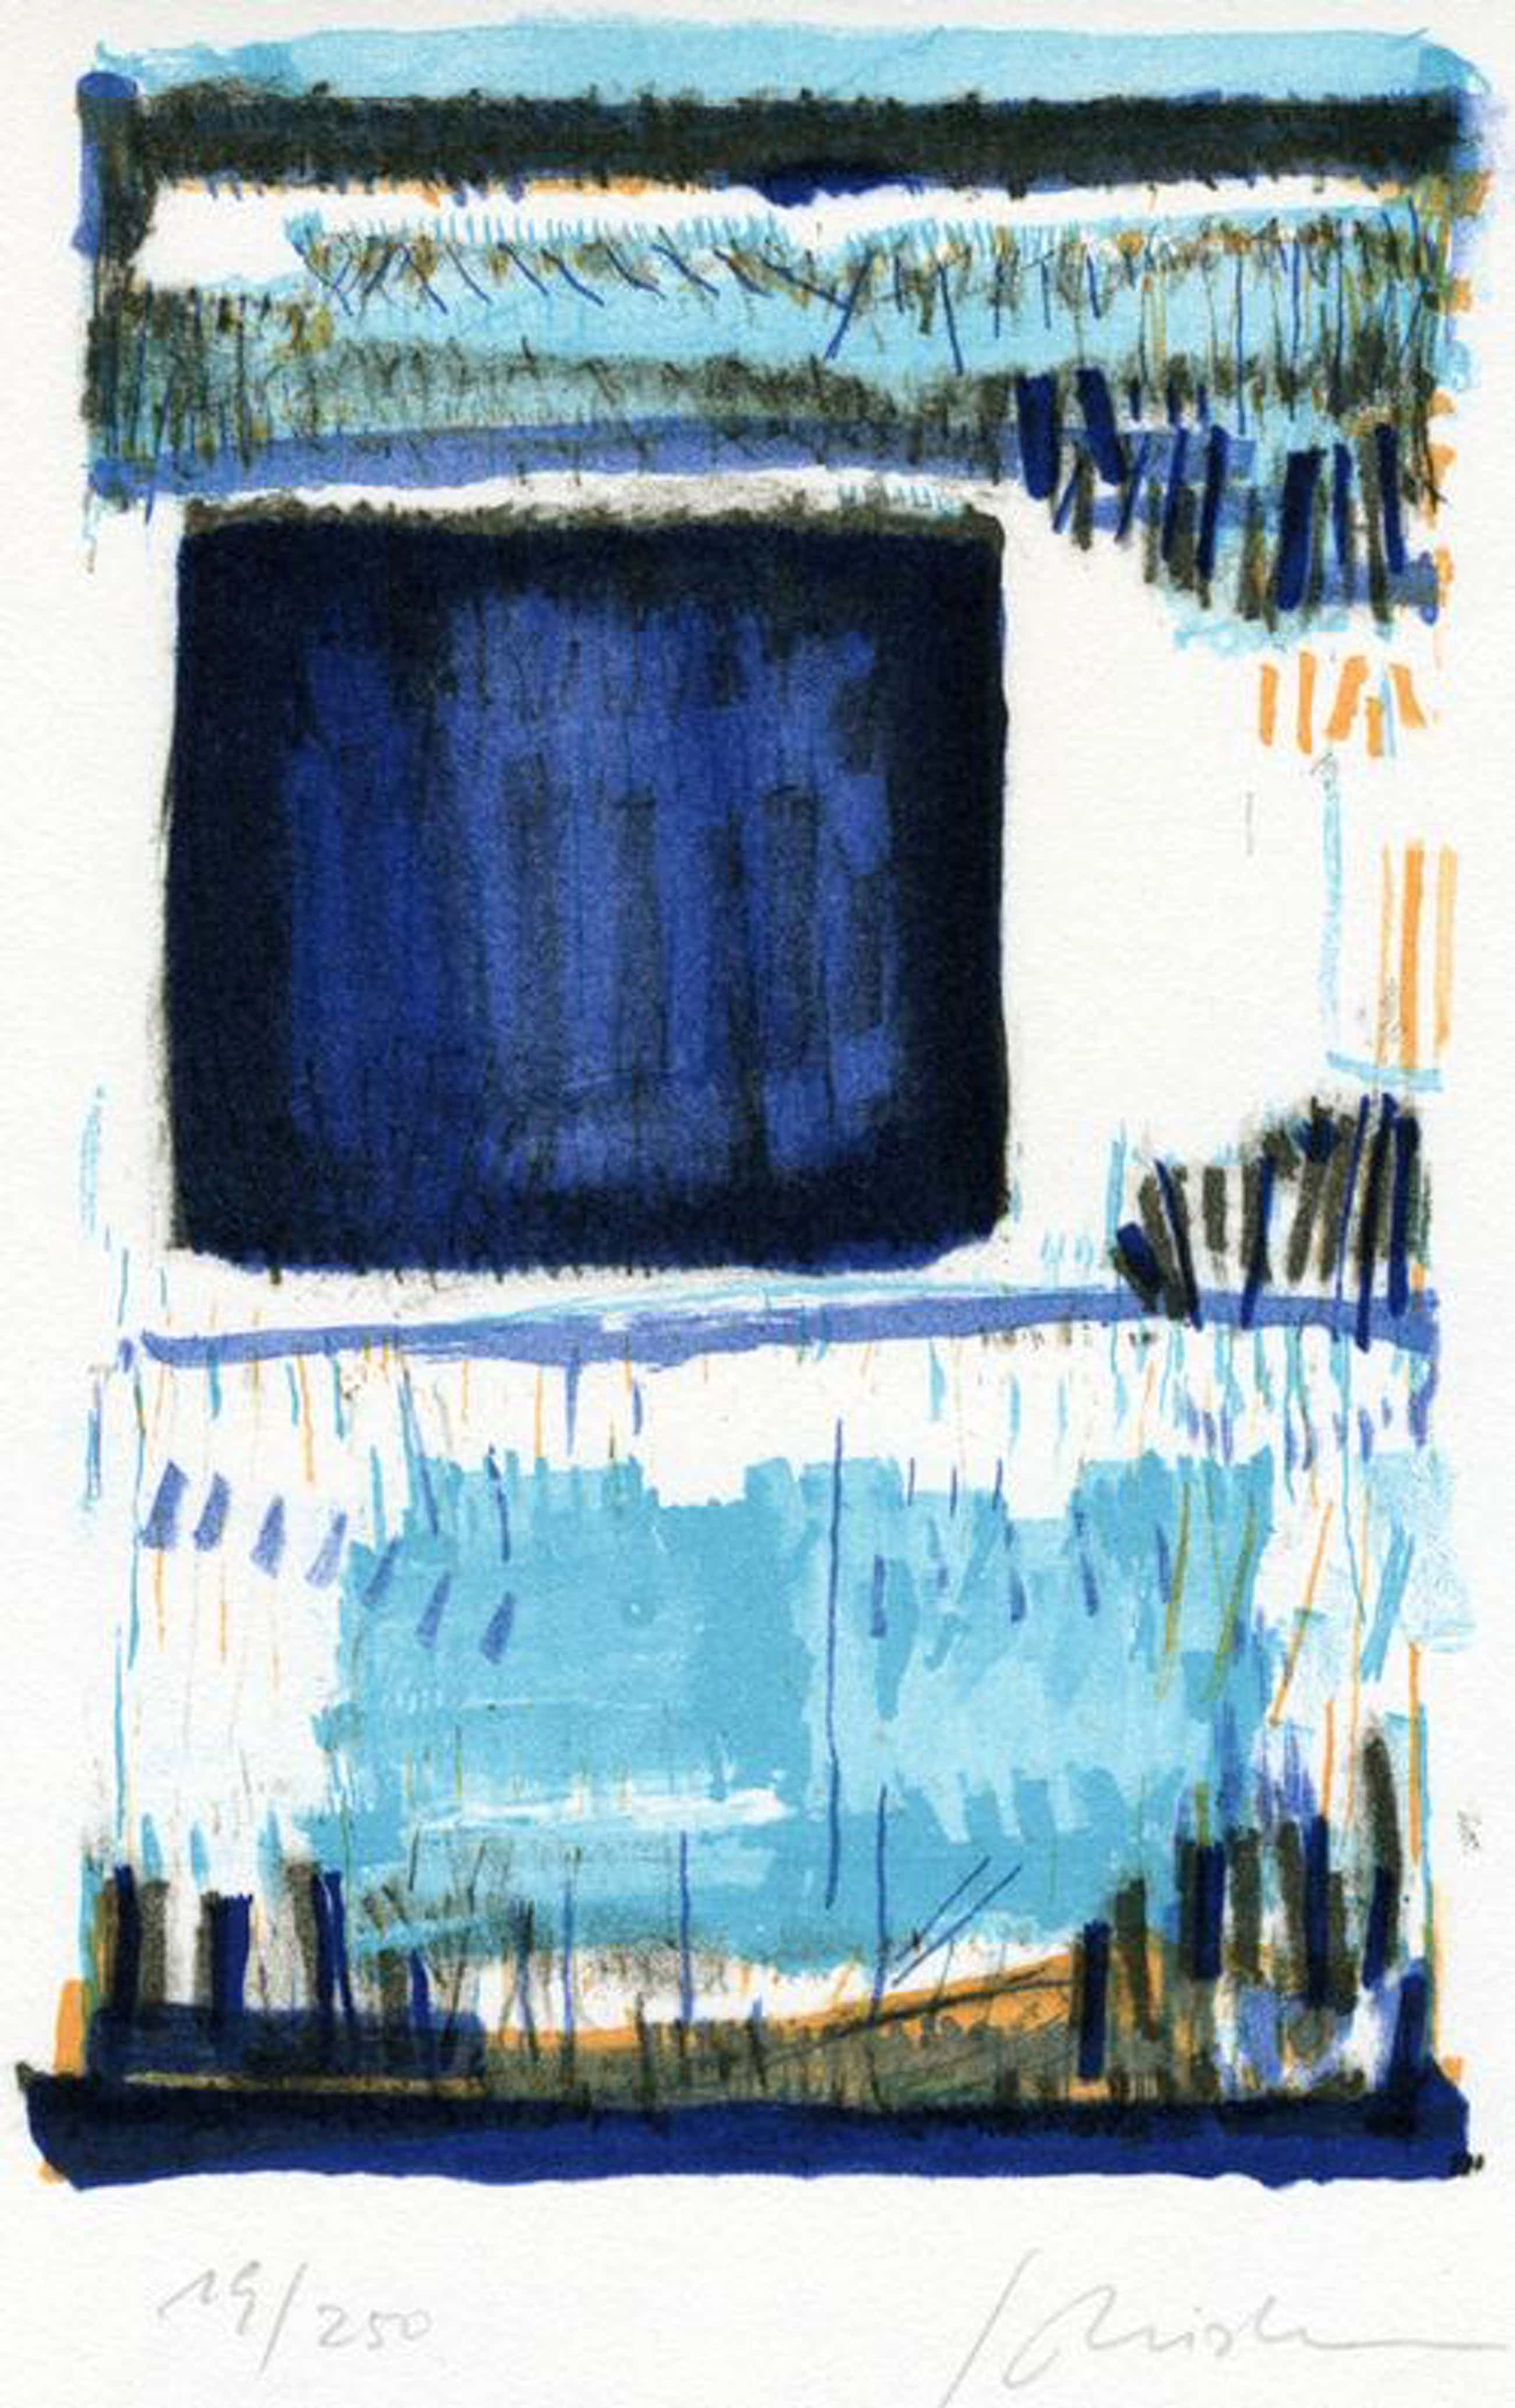 Georg Meistermann - Winterfenster, Litho, 1979 kopen? Bied vanaf 120!